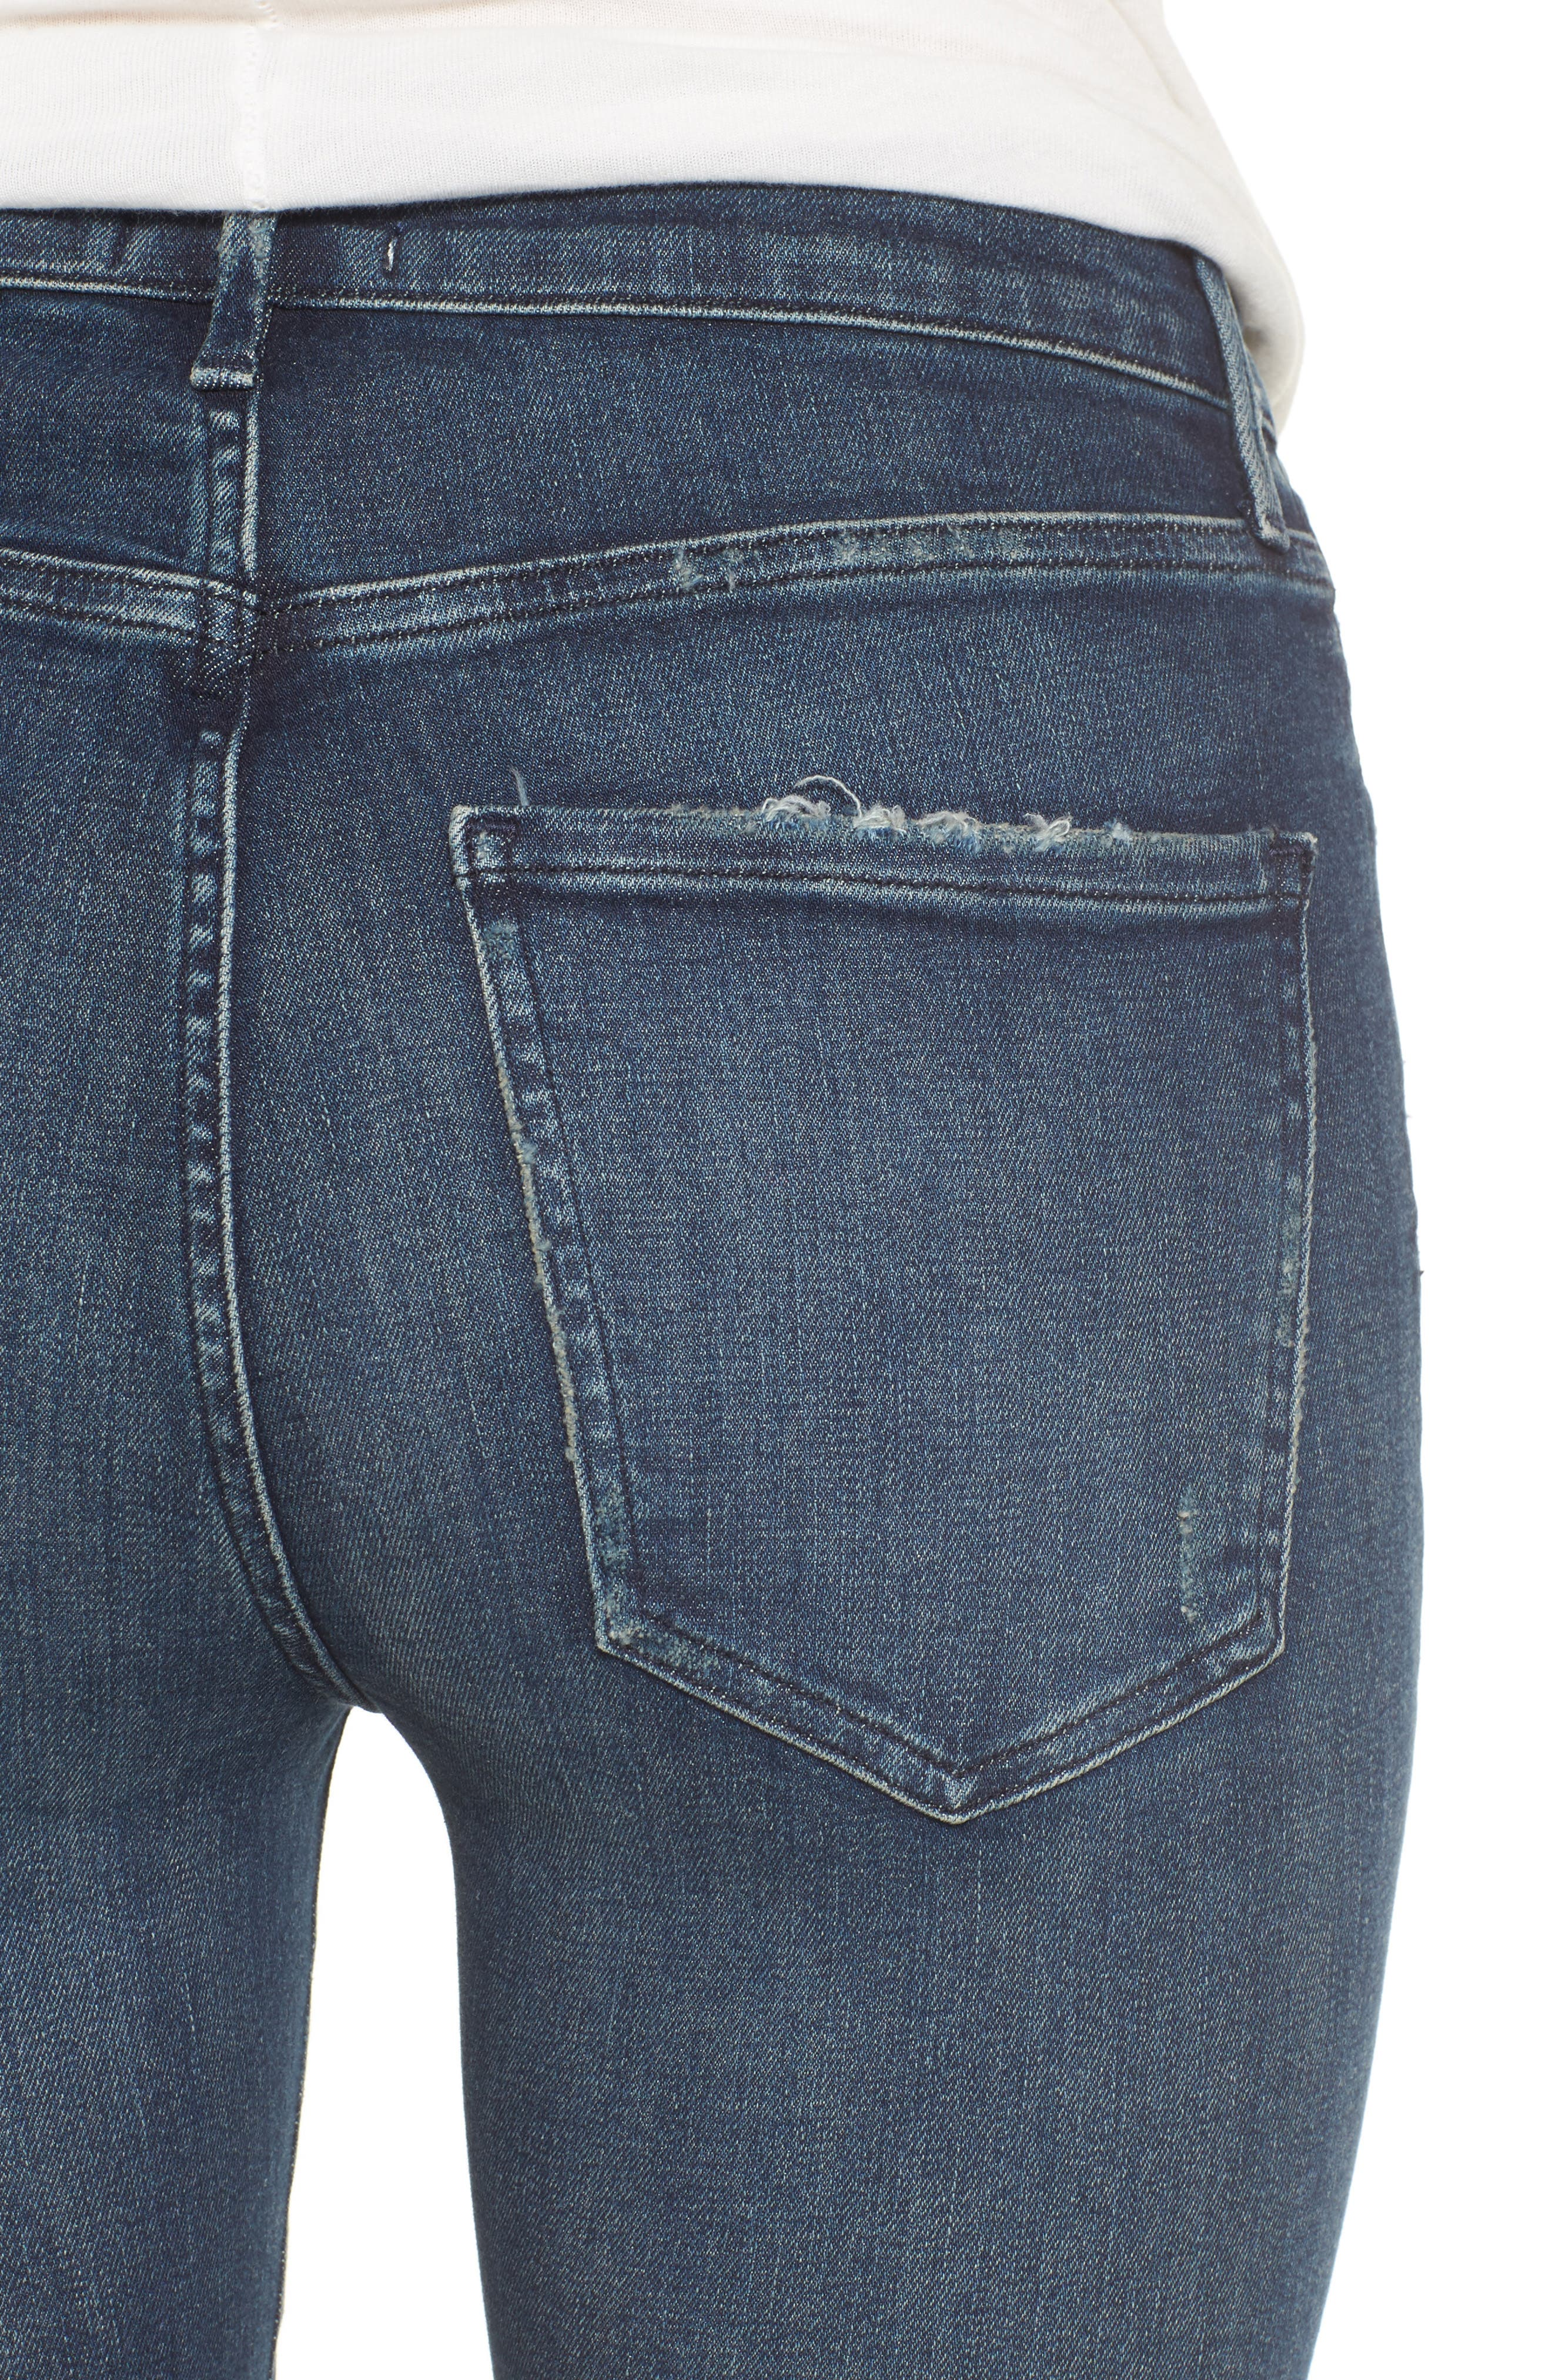 Alternate Image 4  - AGOLDE Sophie High Waist Skinny Jeans